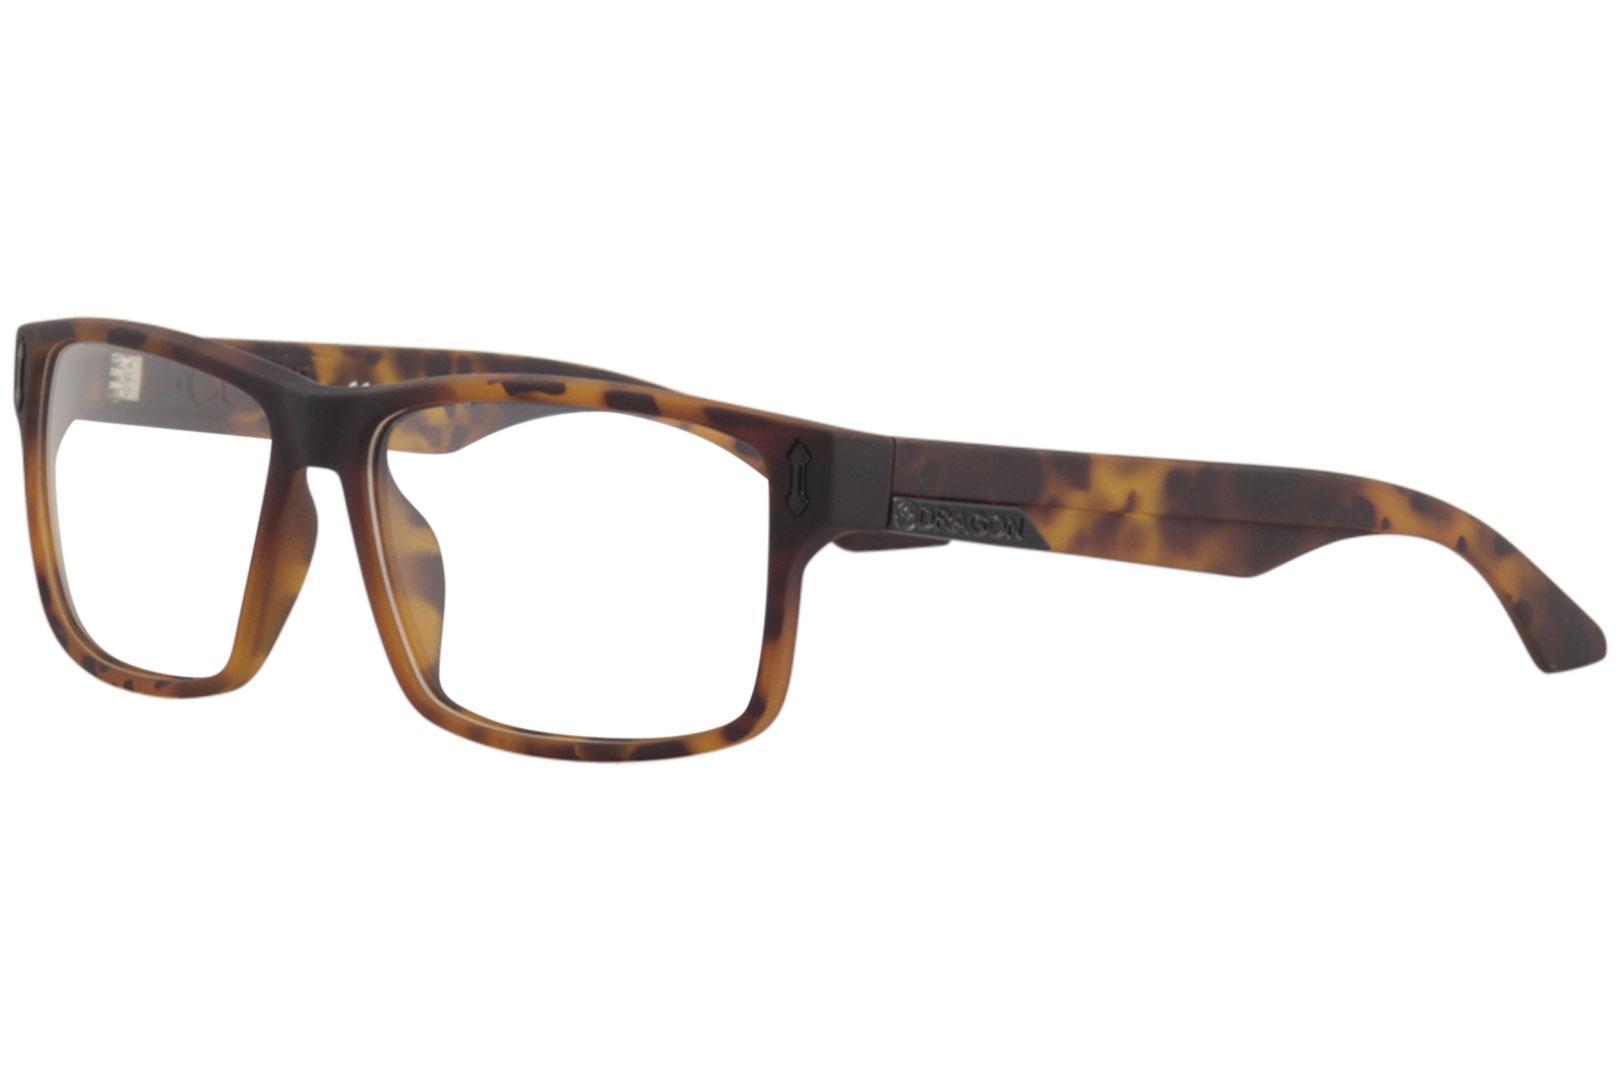 3a7fe2c9e38 Dragon Count Eyeglasses DR126 DR 126 Full Rim Optical Frame